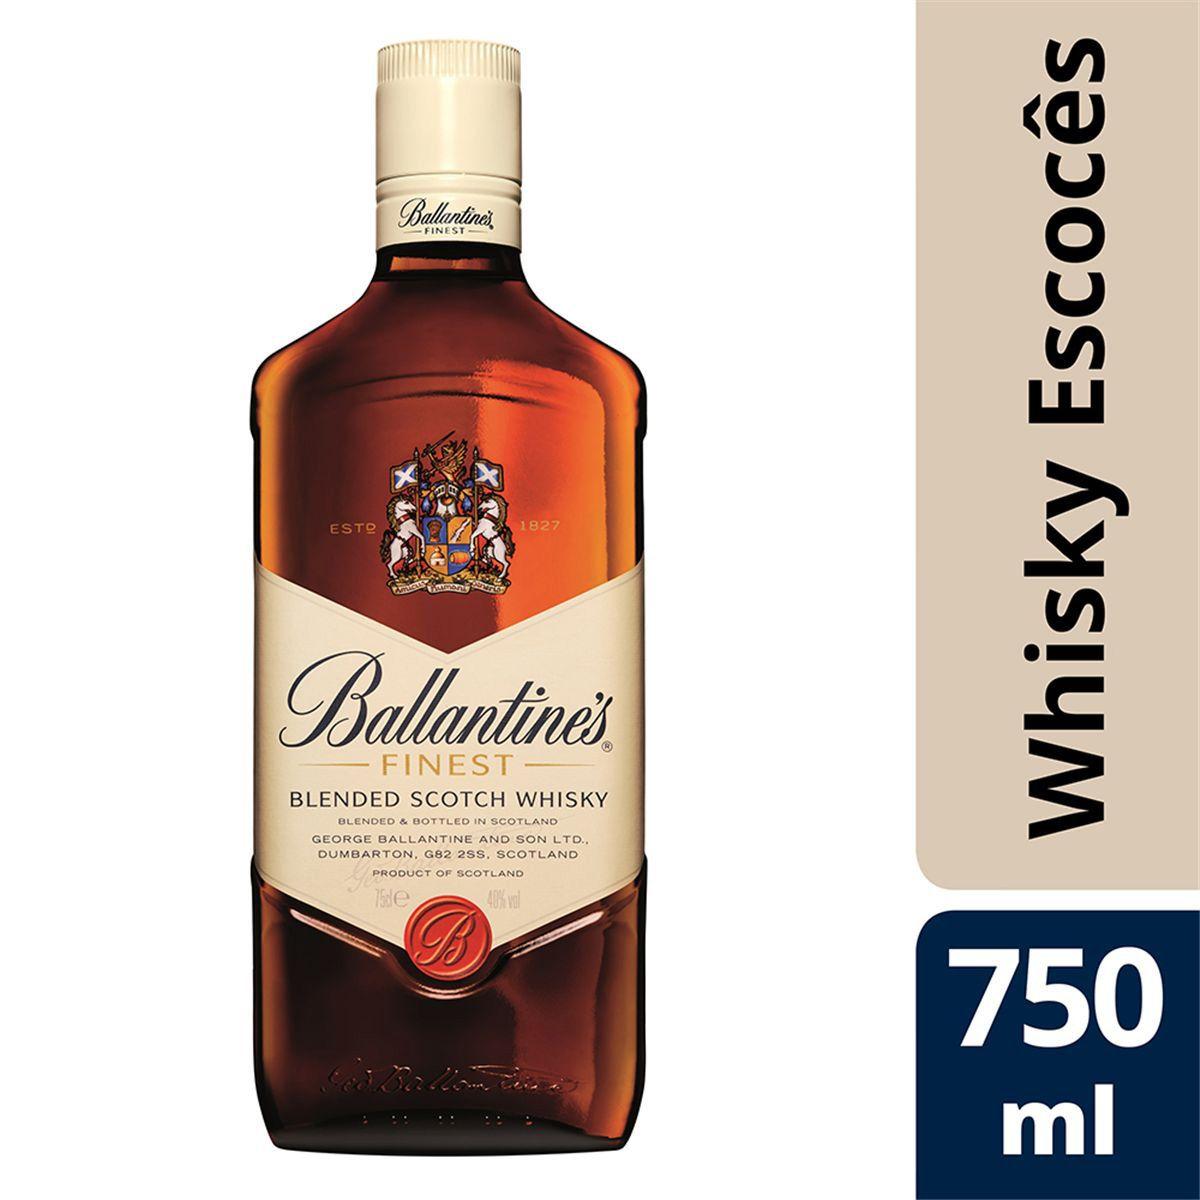 Whisky Ballantine`s Finest - 750ml